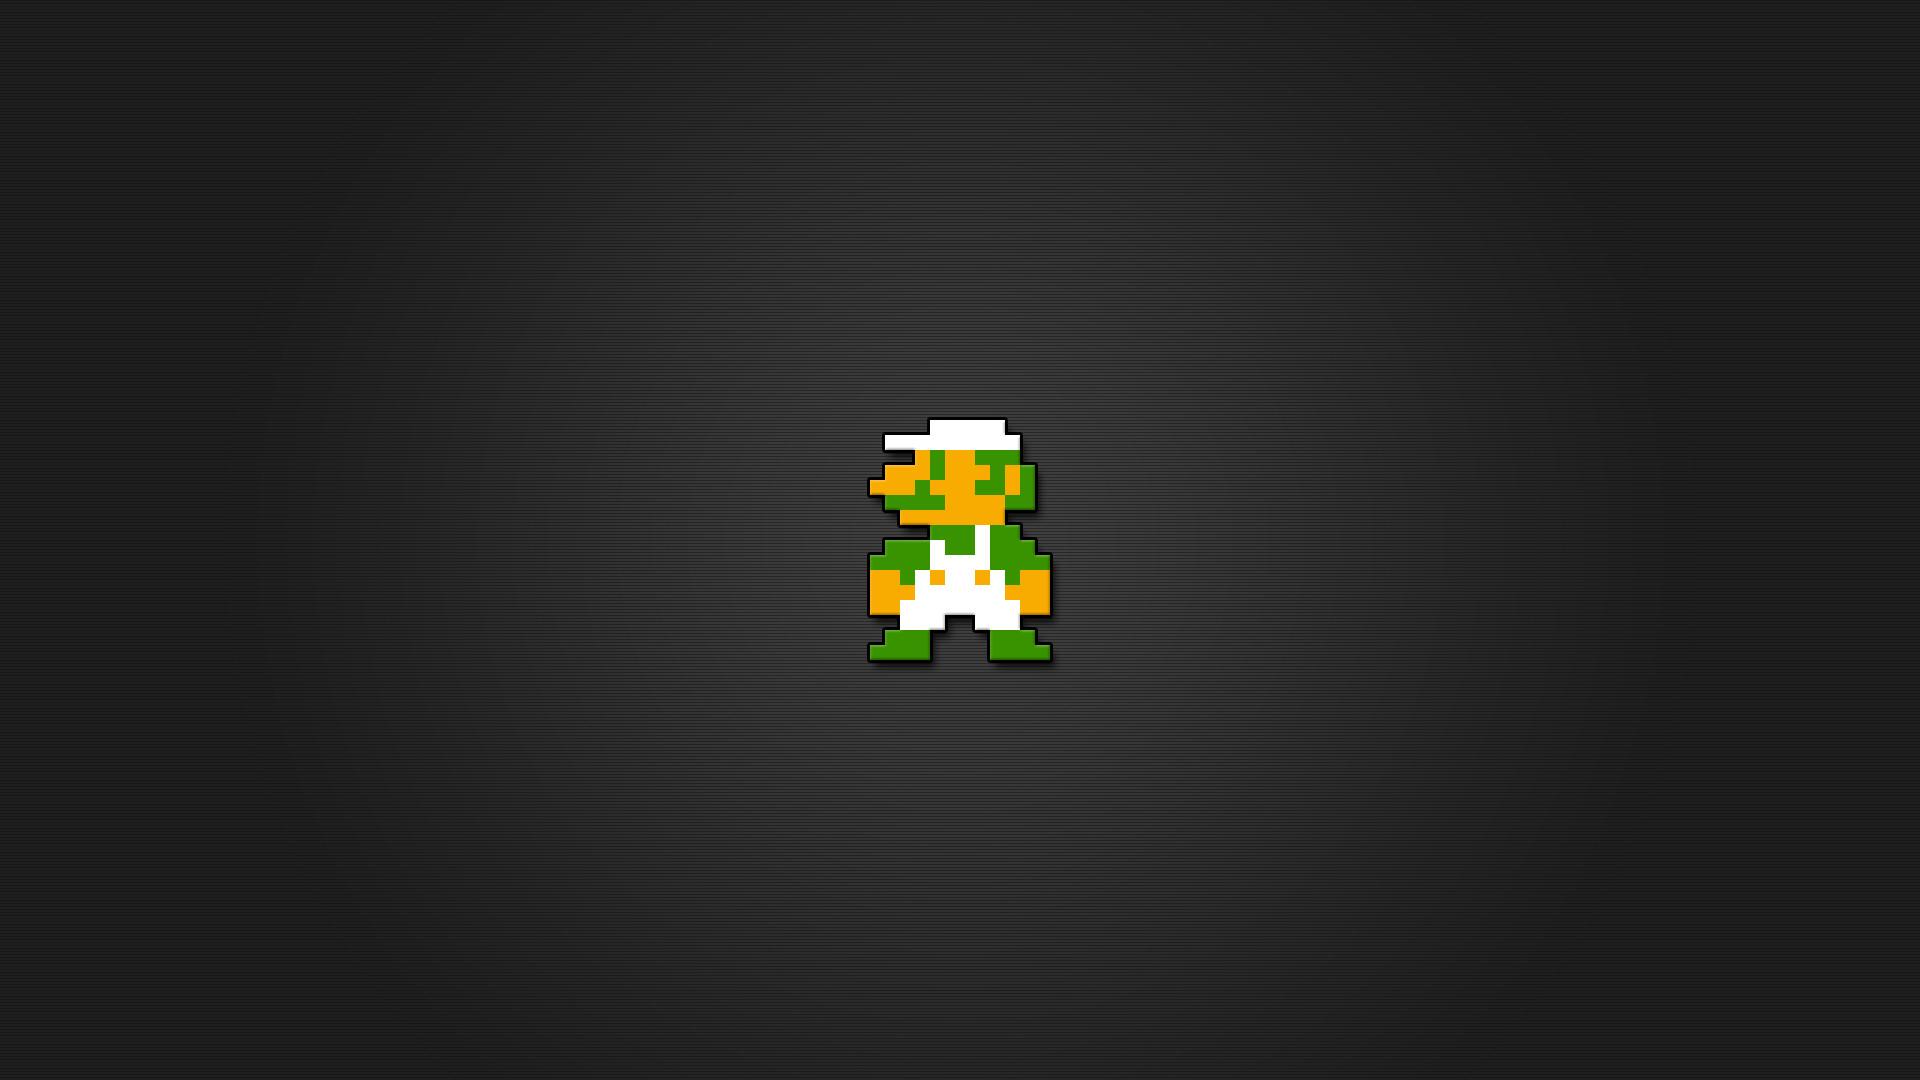 Luigi 8bit Wallpaper HD by LaChRiZ on DeviantArt